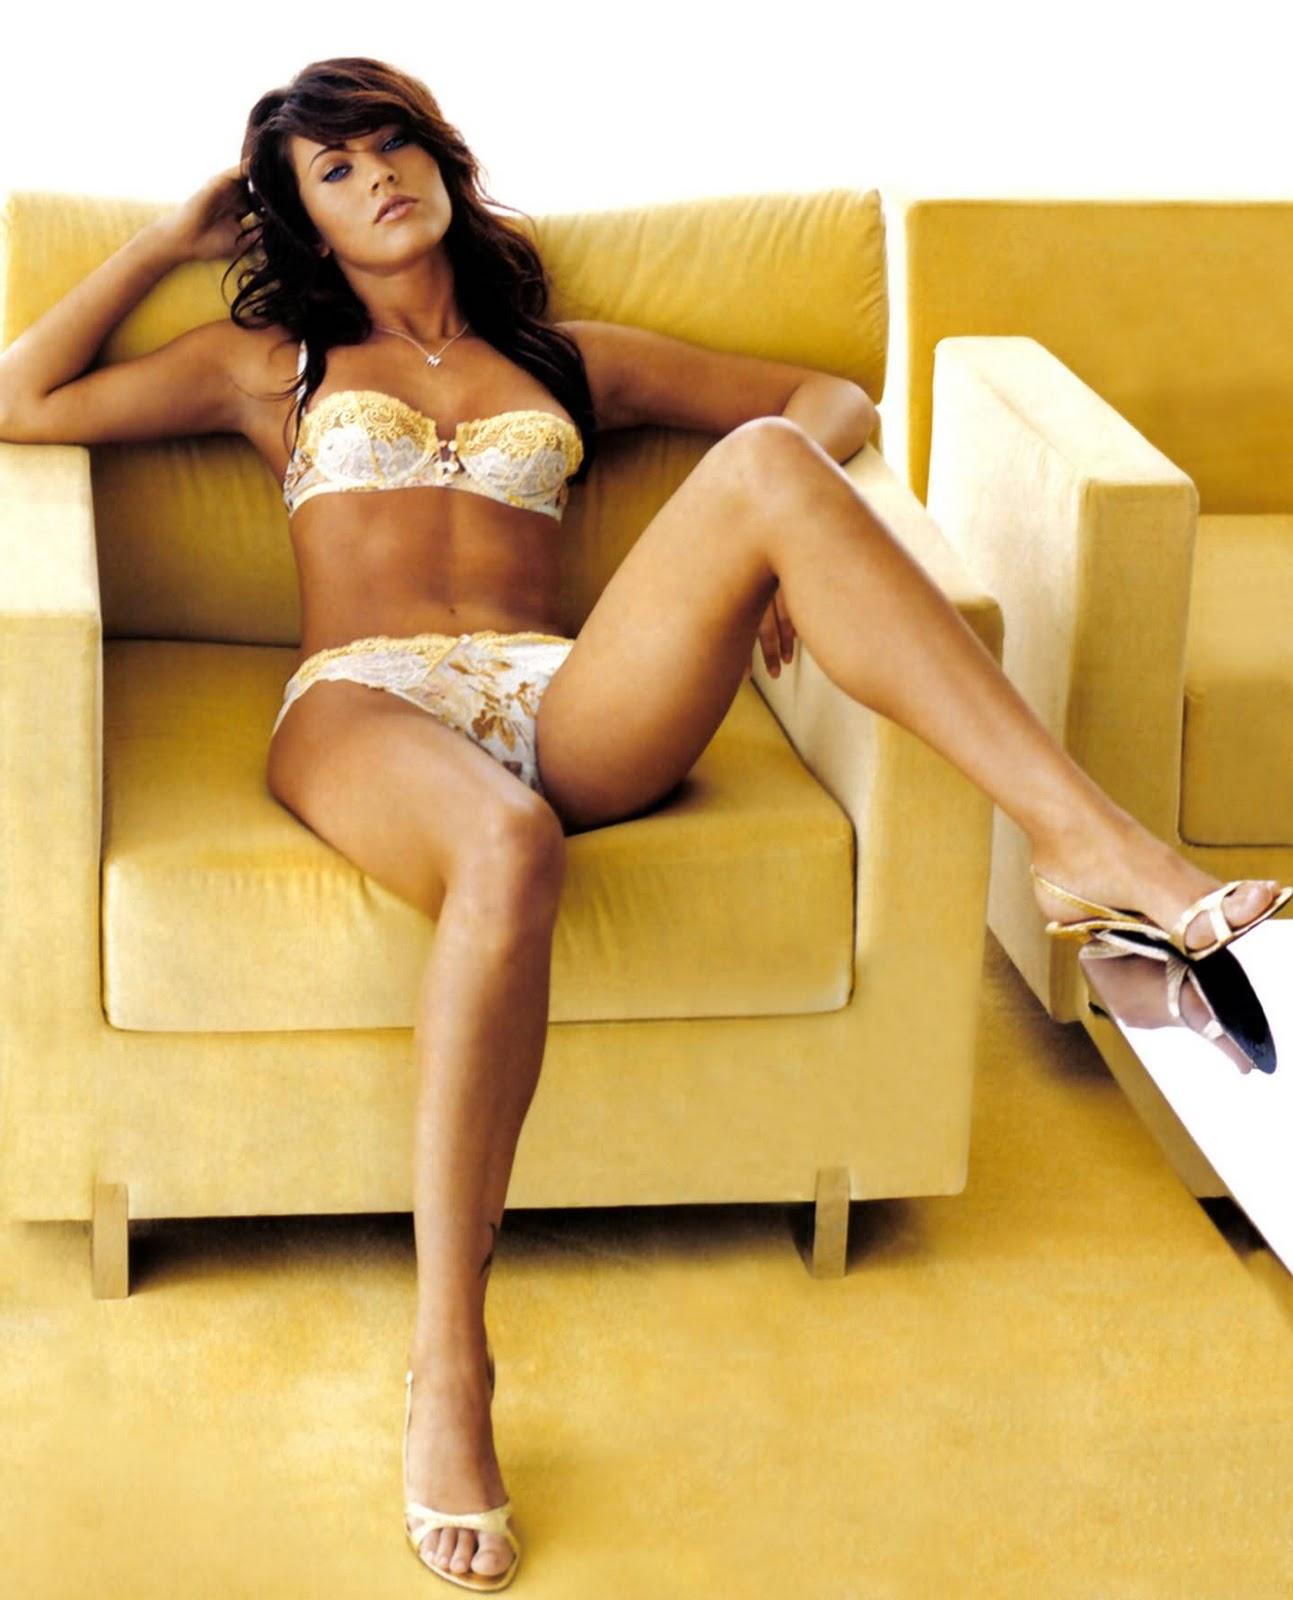 Megan Fox: Hot Candy Girls: Megan Fox